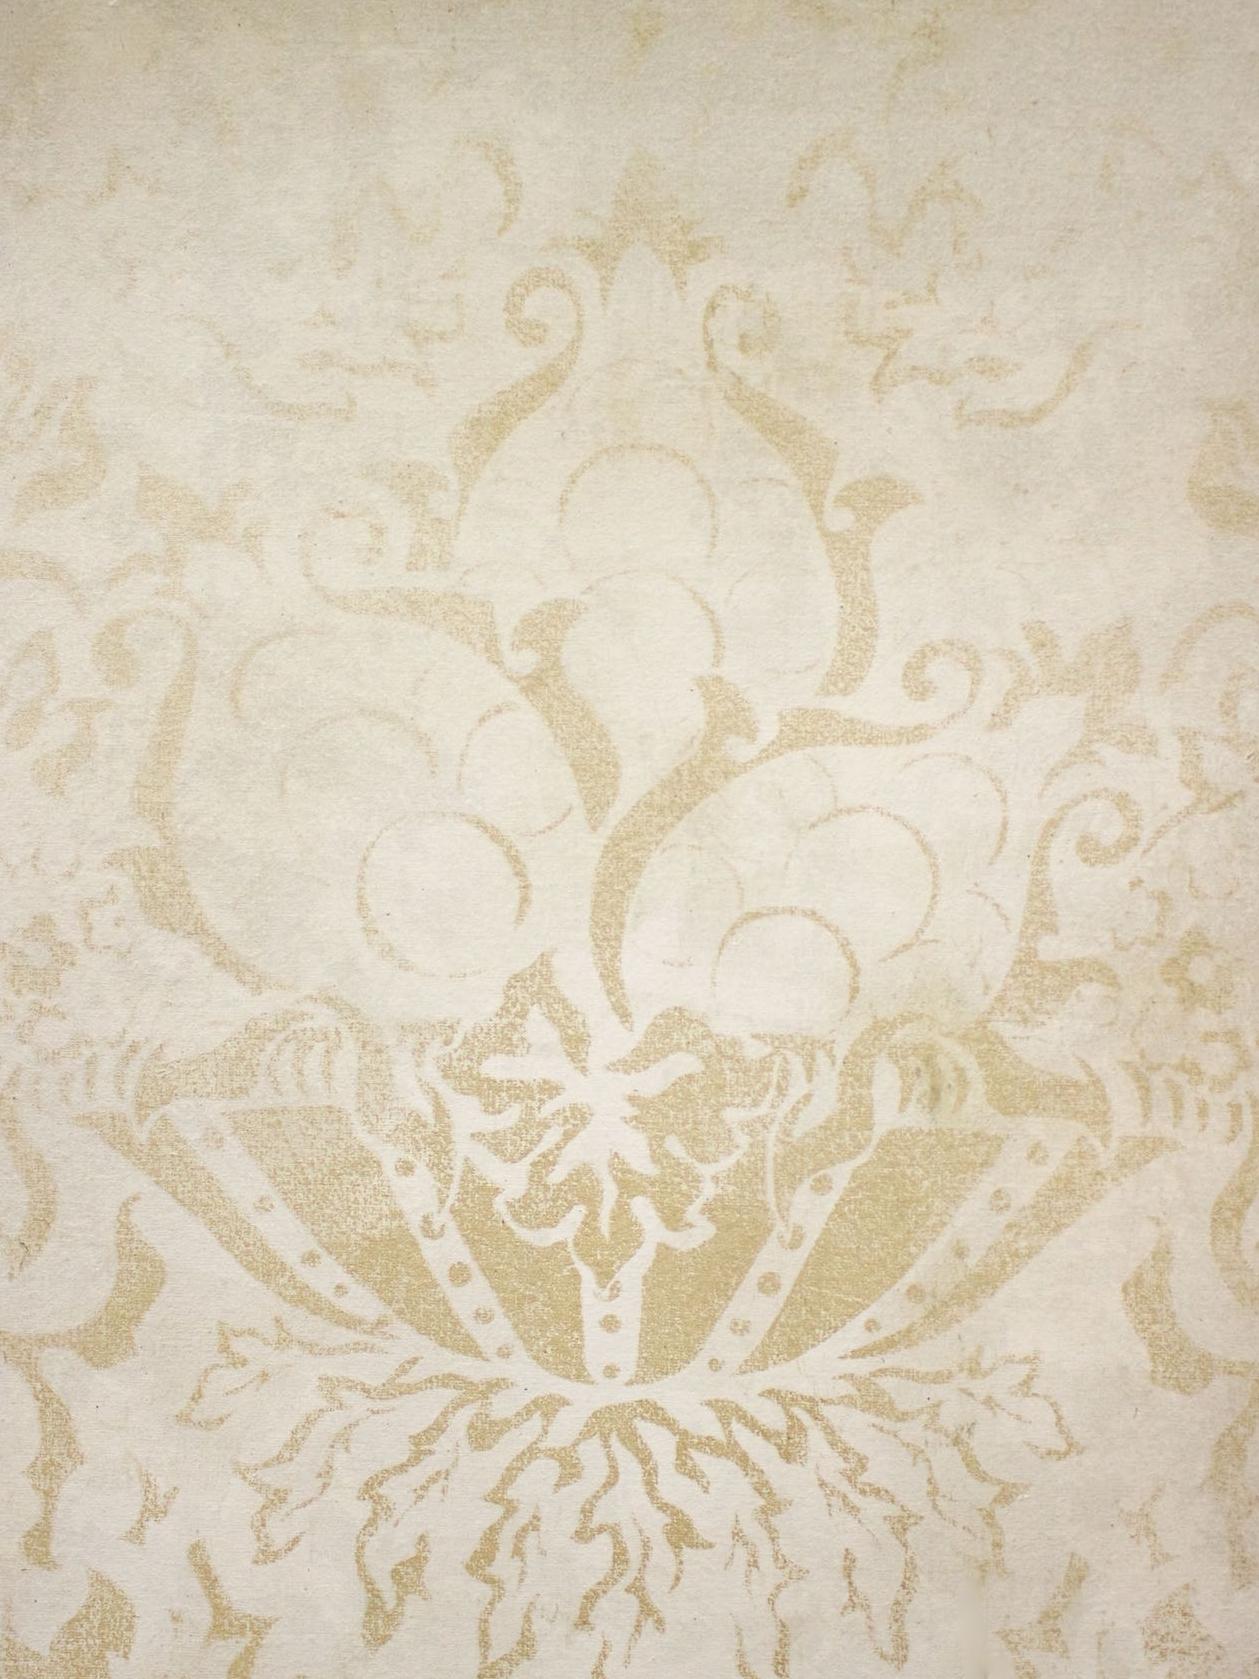 Pomme in Polished Ivory (1).jpg